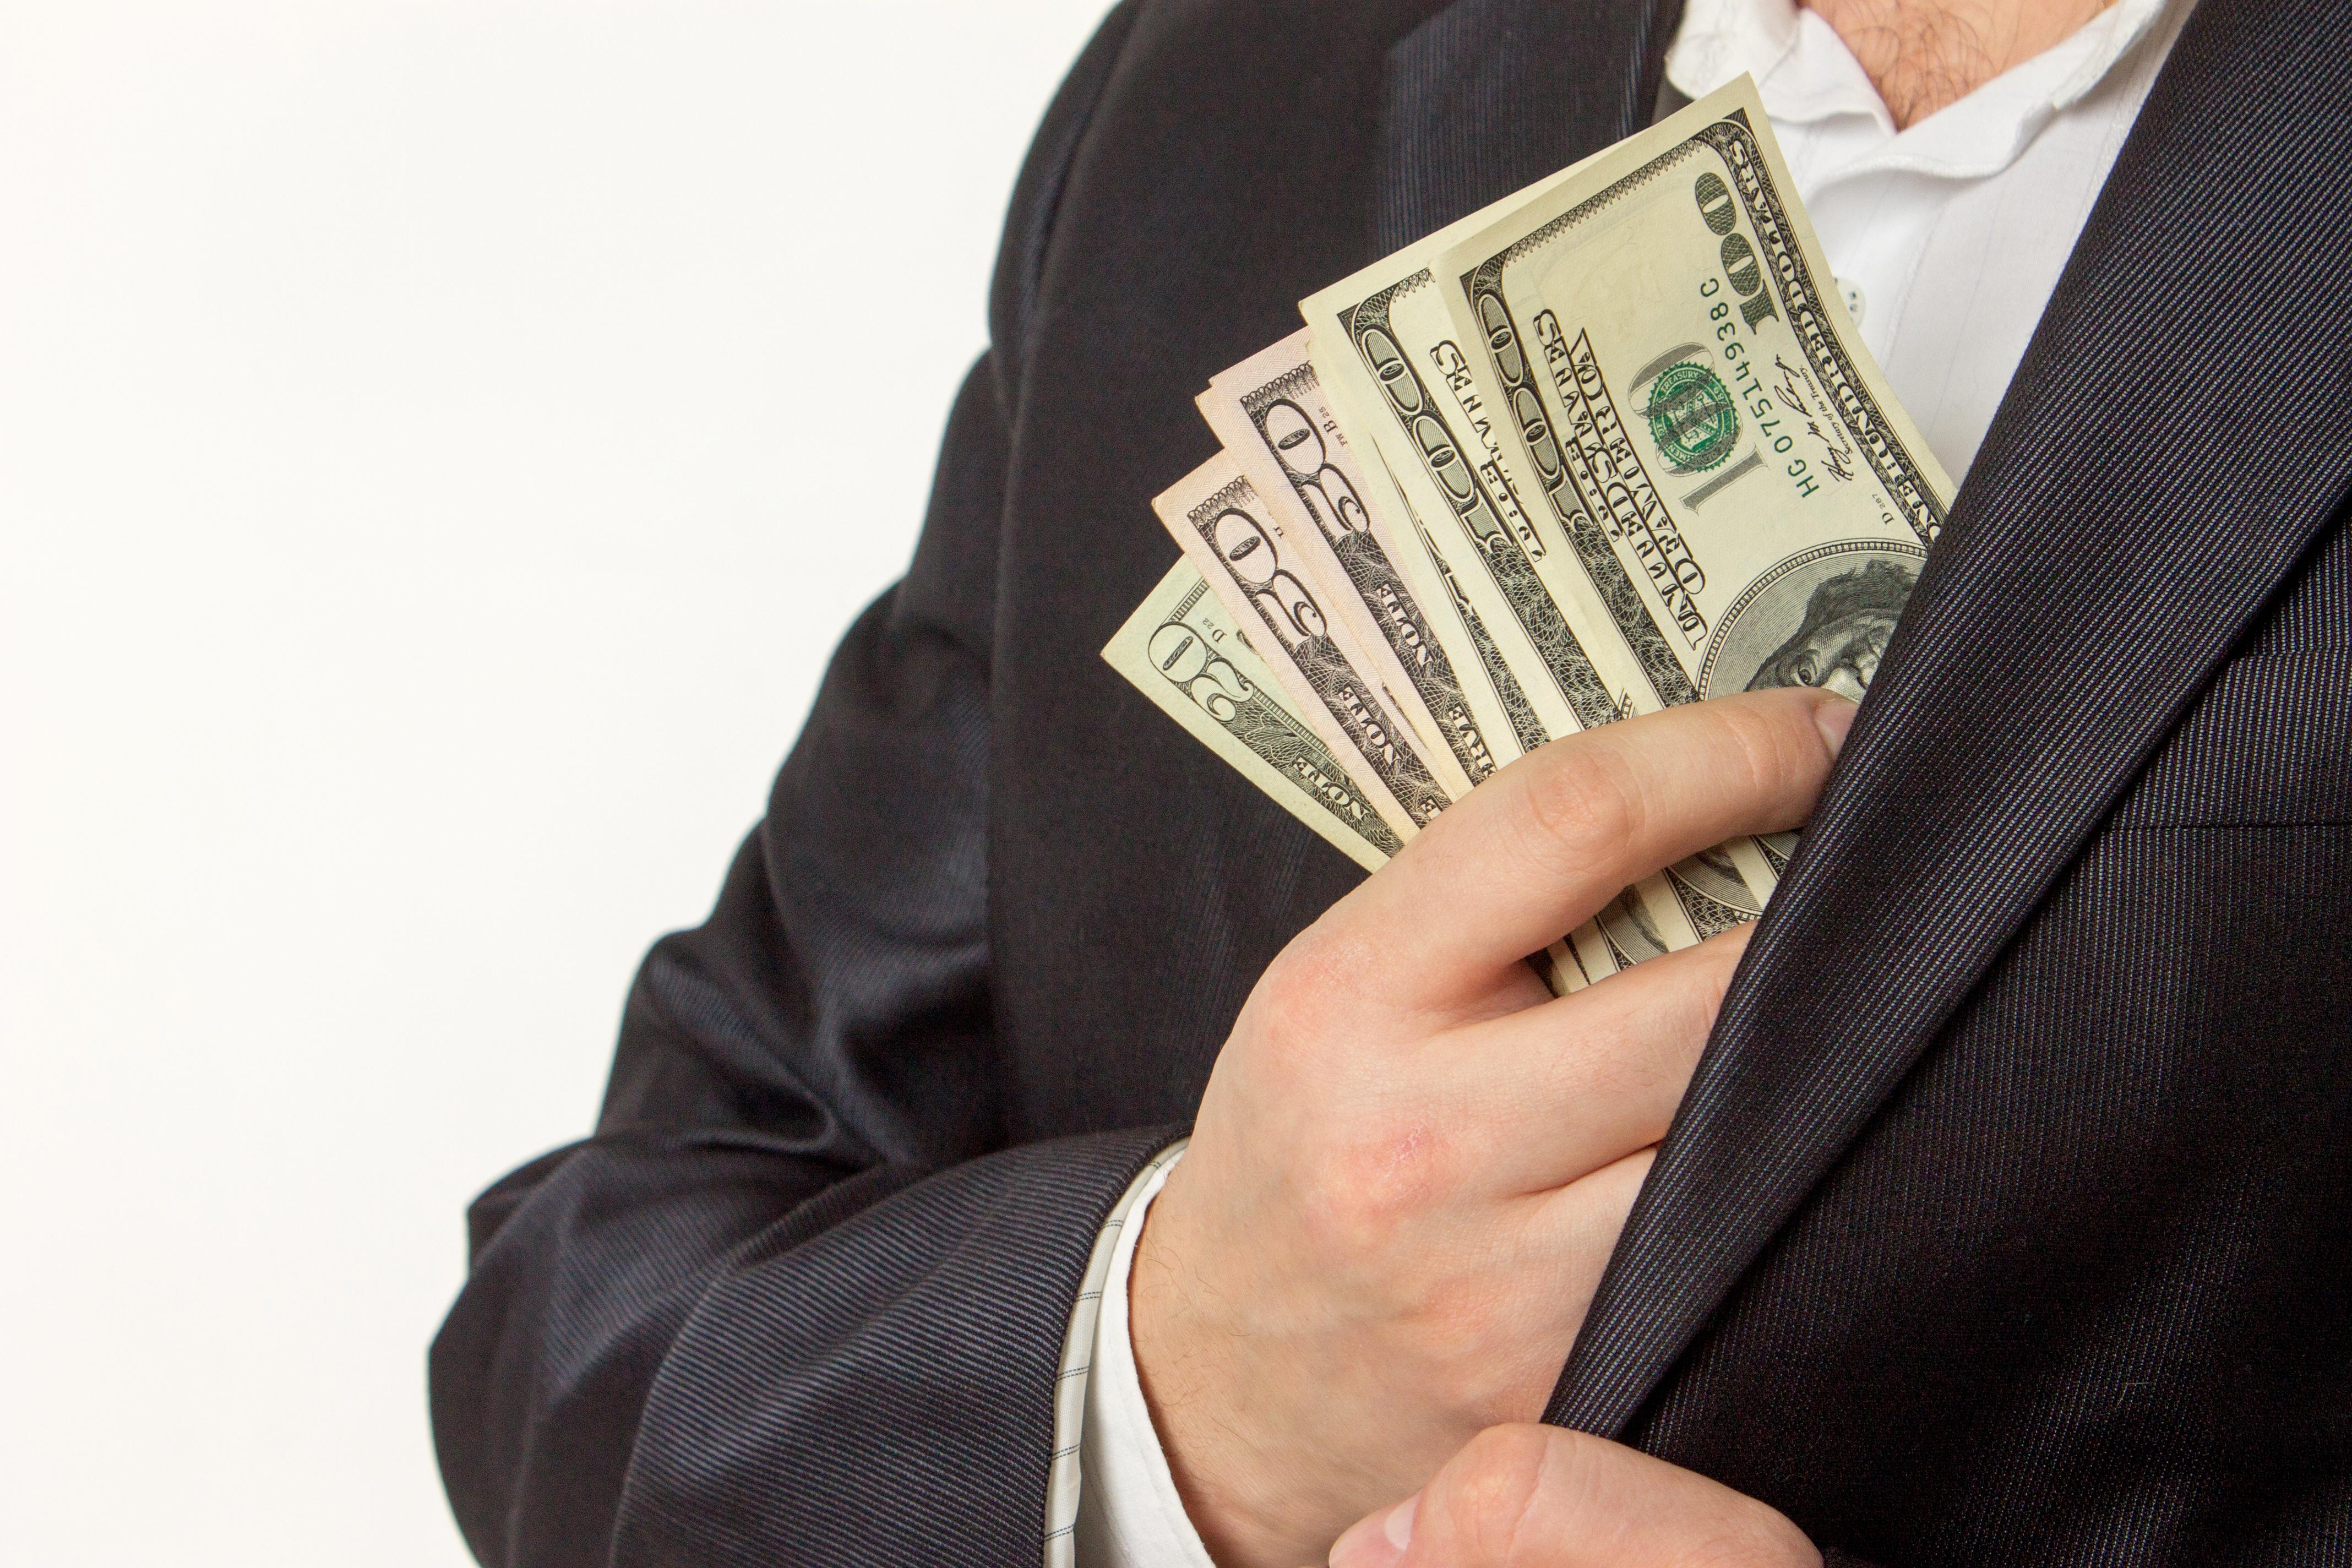 Man putting money into his pocket